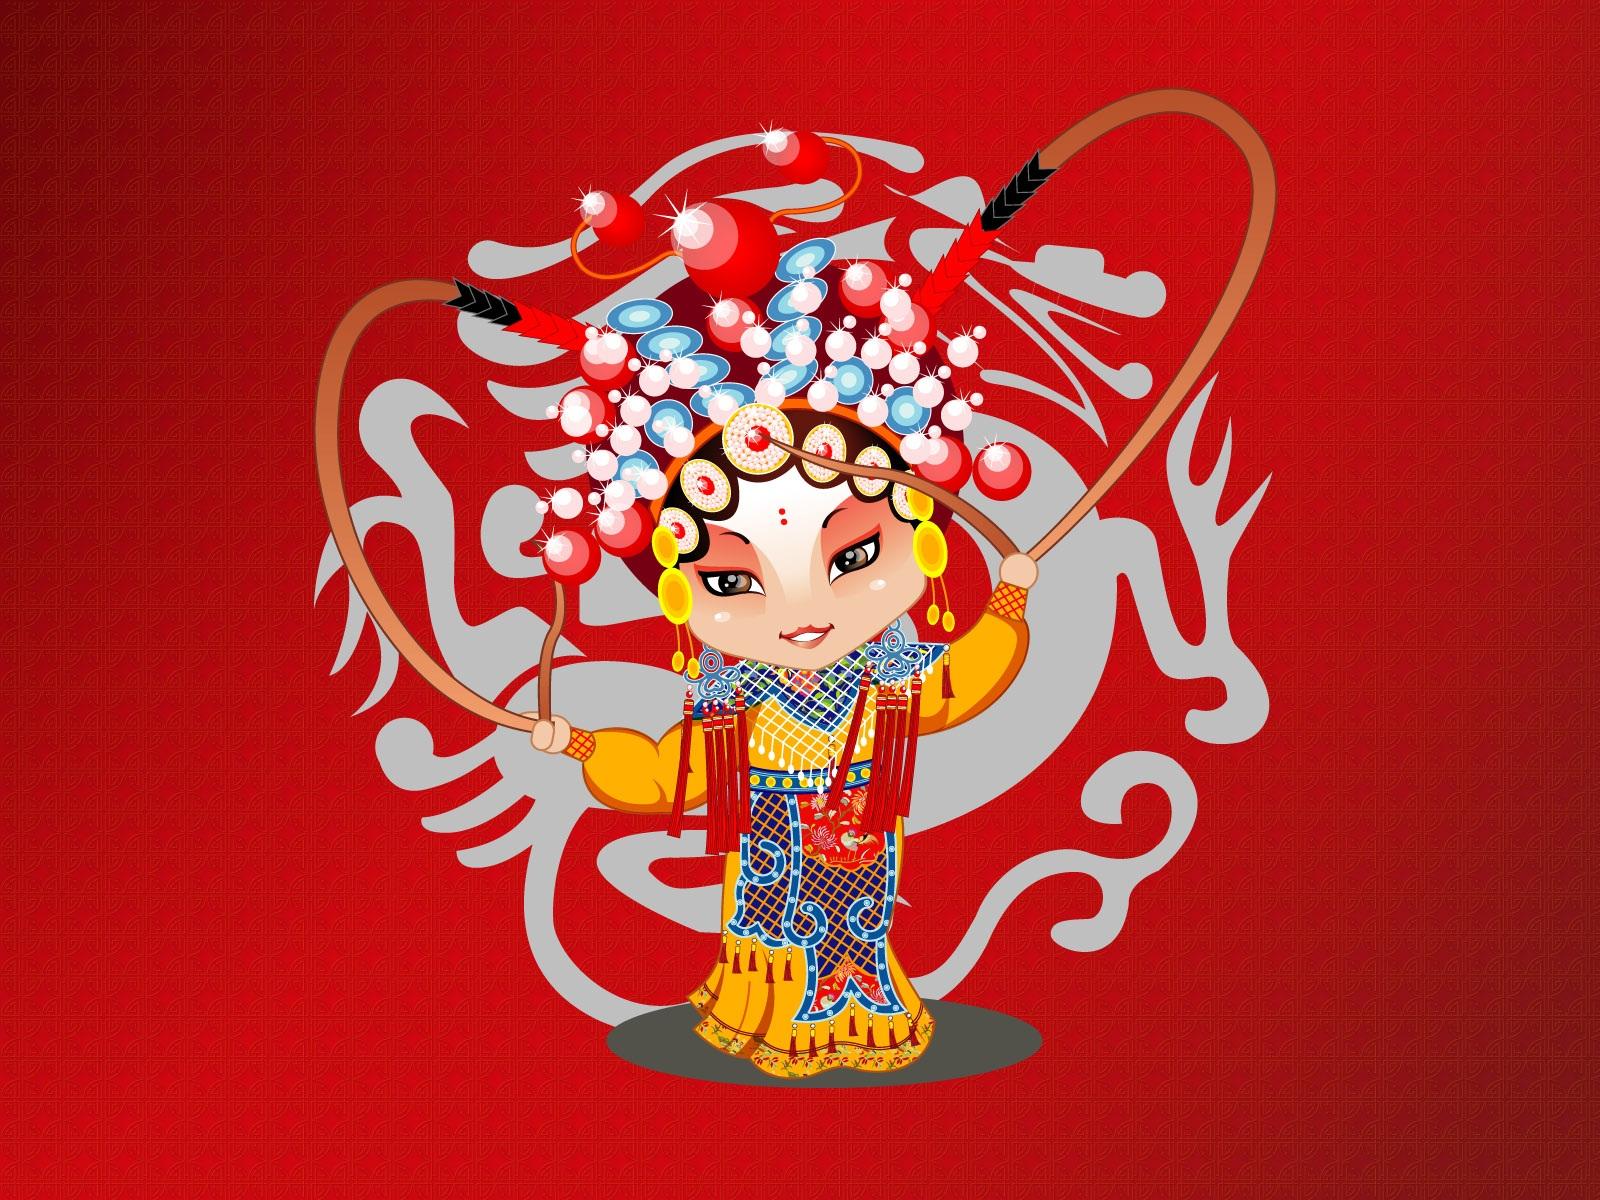 http://1.bp.blogspot.com/-oLCWv8IVllM/T5JhnZMZntI/AAAAAAAAALc/p7CQ9qEFckE/s1600/Beijing+Opera9.jpg